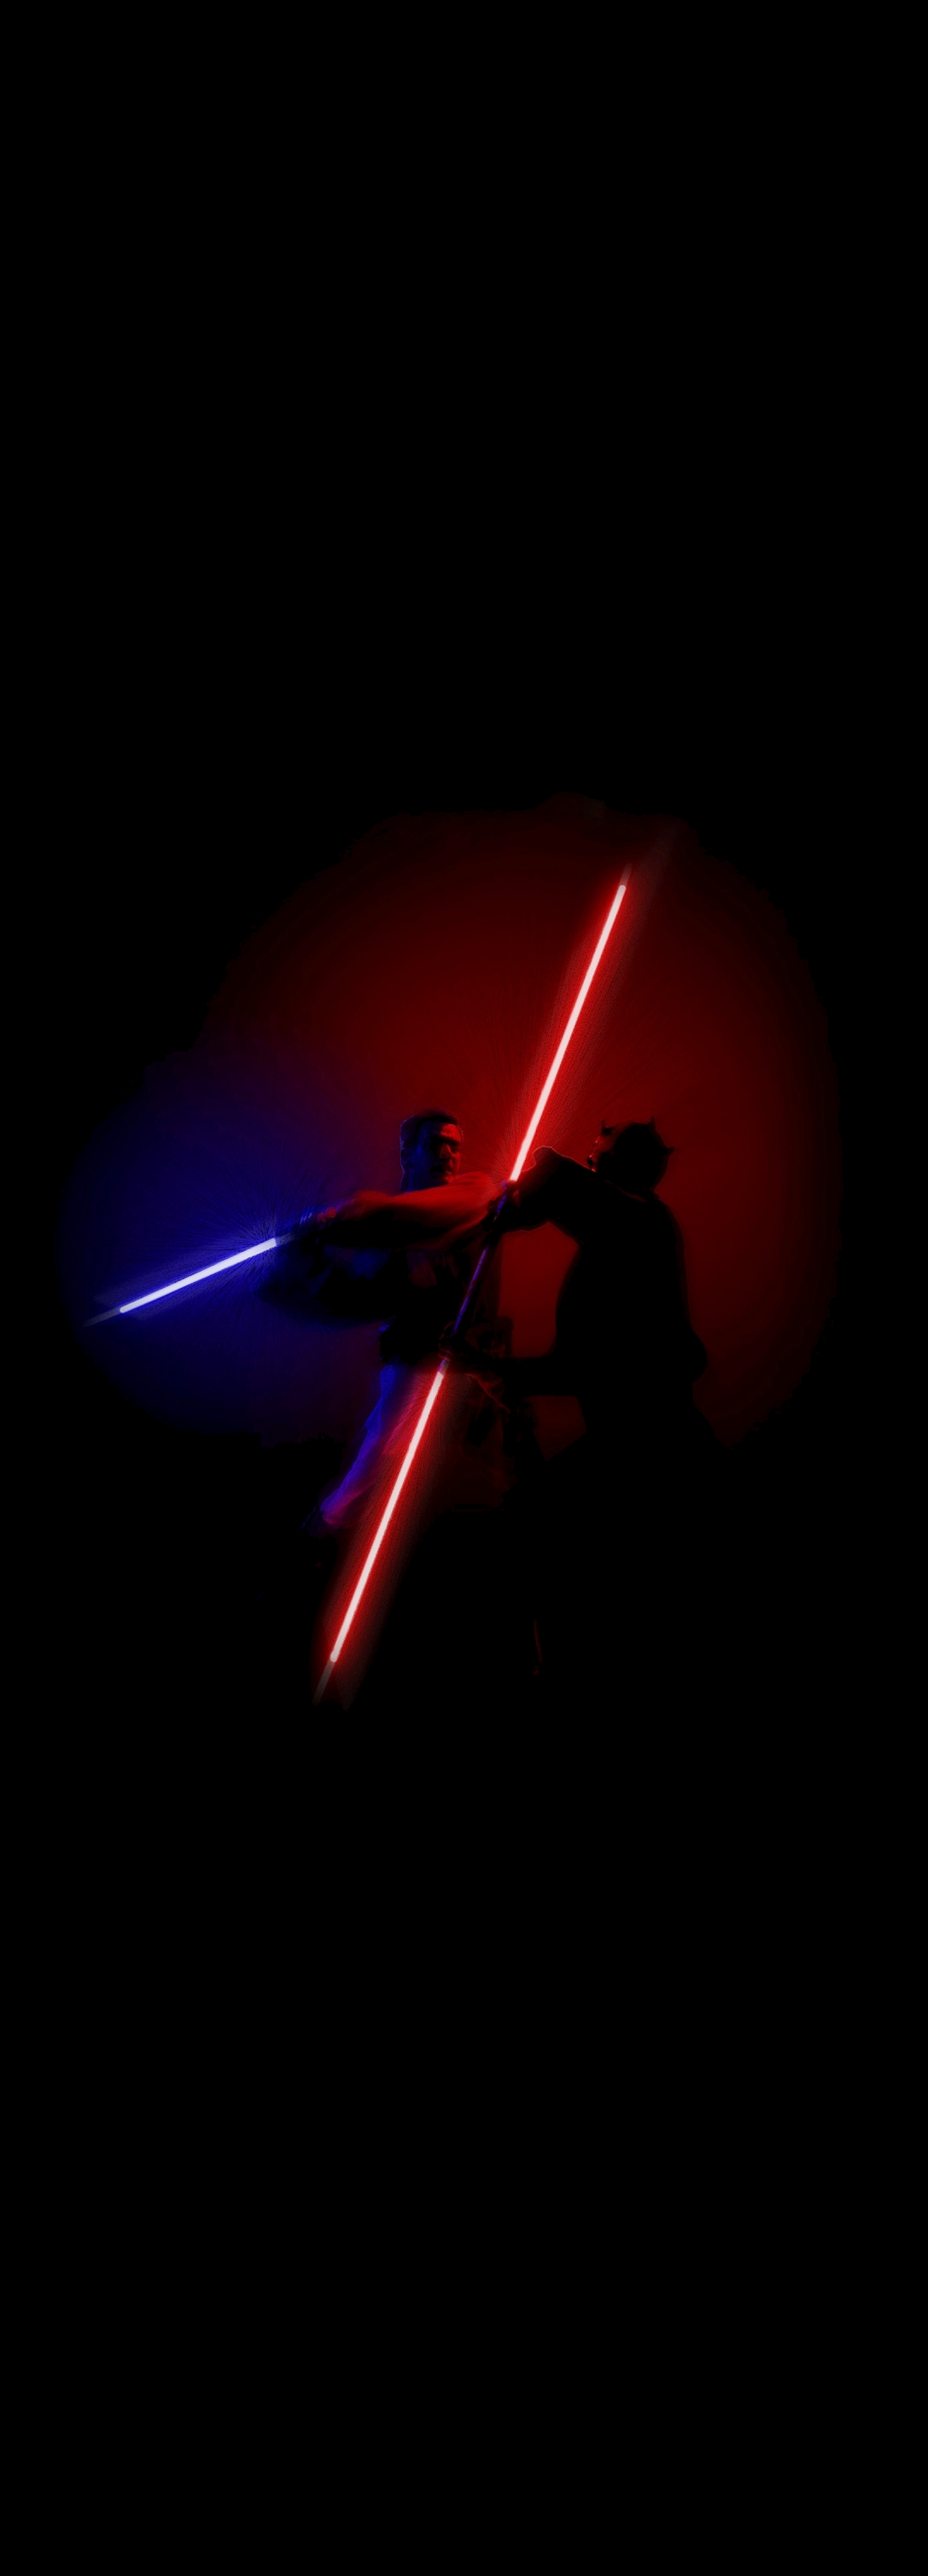 Obi Wan vs Darth Maul Phone Wallpaper PrequelMemes